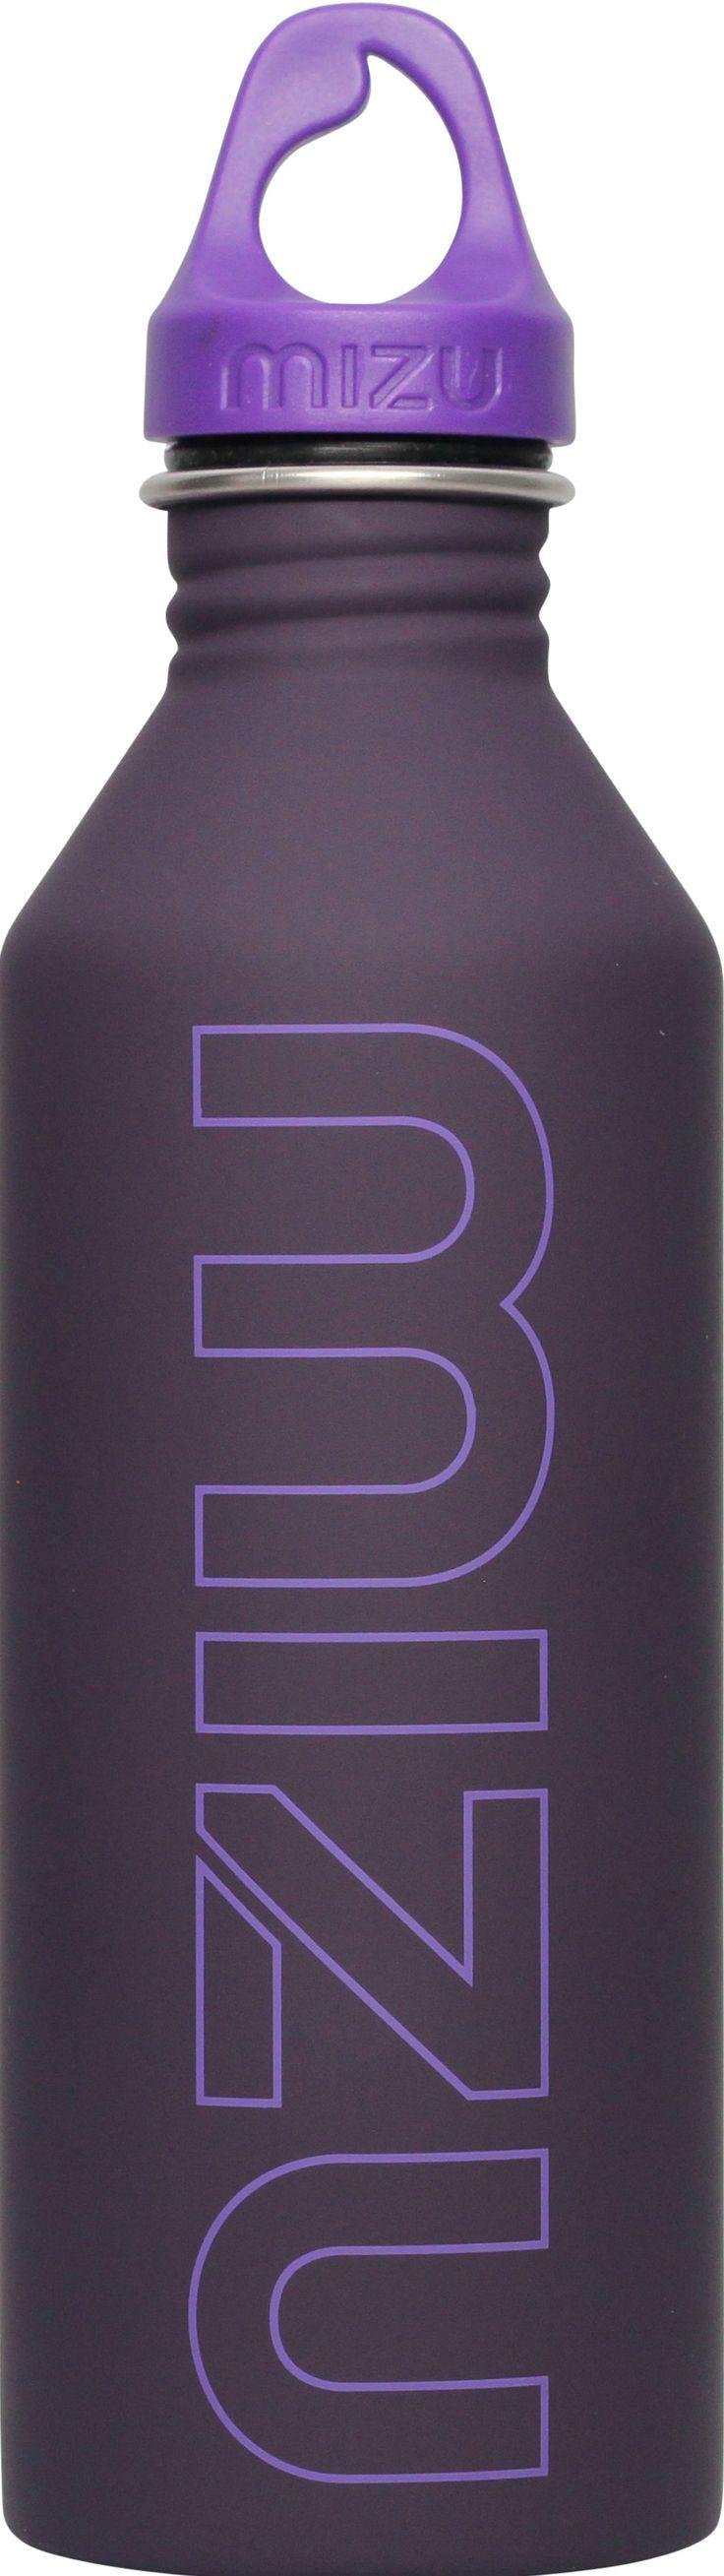 Mizu bottle purple